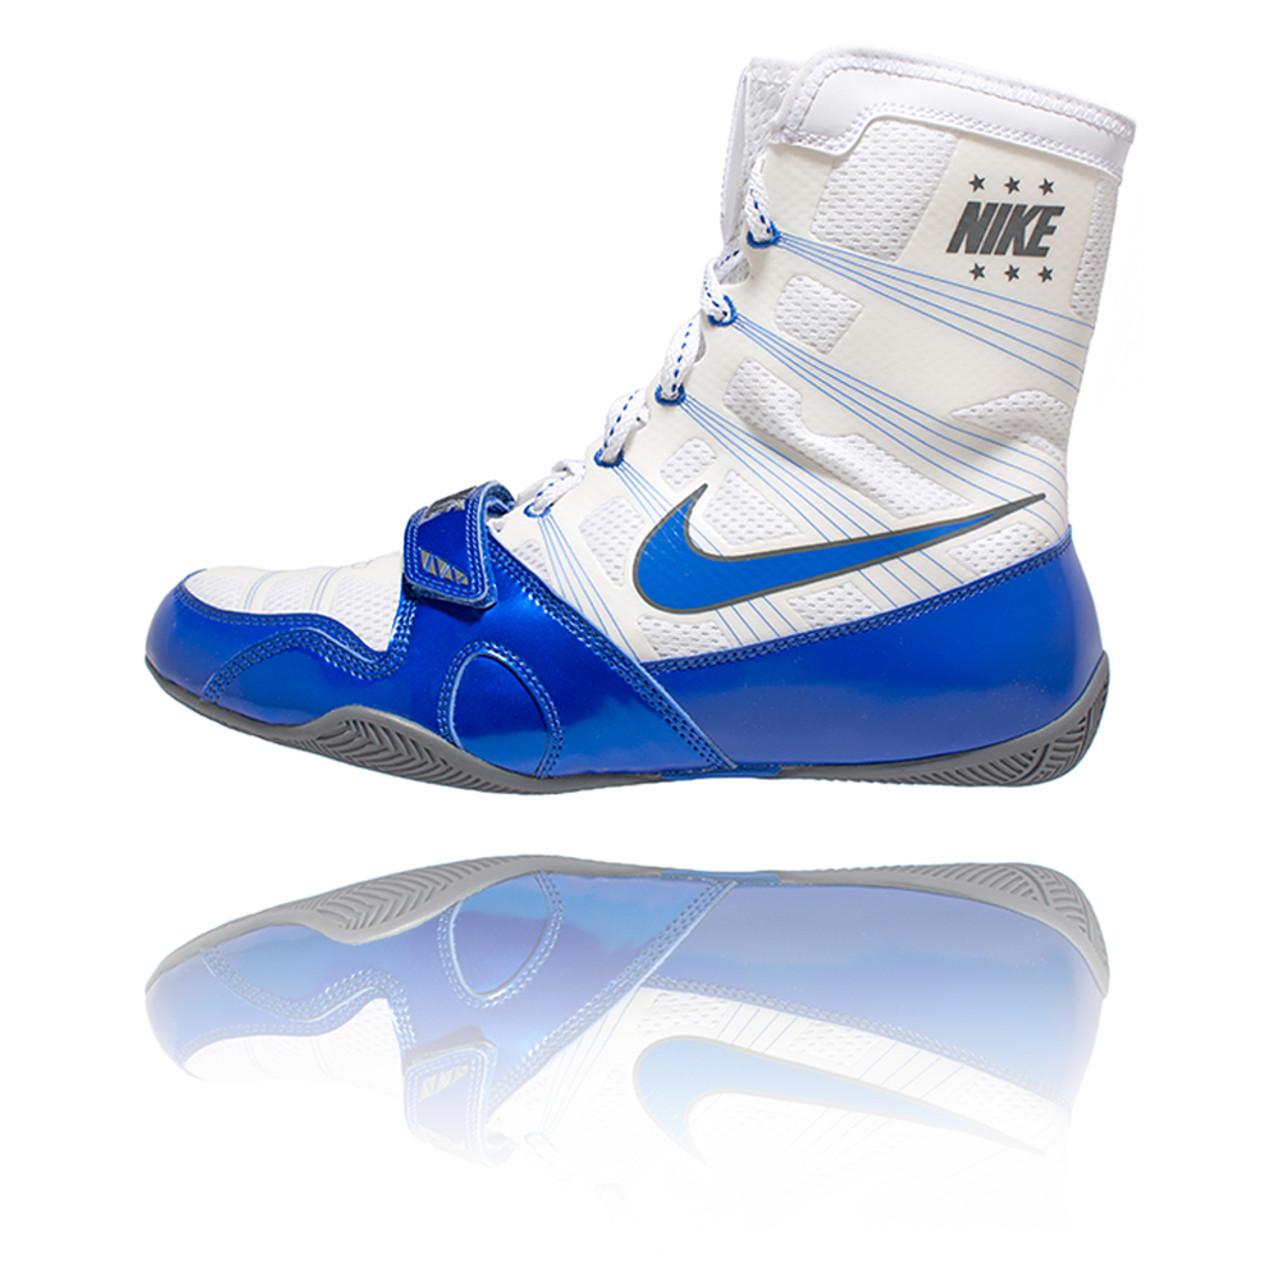 sale retailer a9d73 99ea0 Nike HyperKO - White   Game Royal Boxing Shoes - PRO BOXING SHOP®